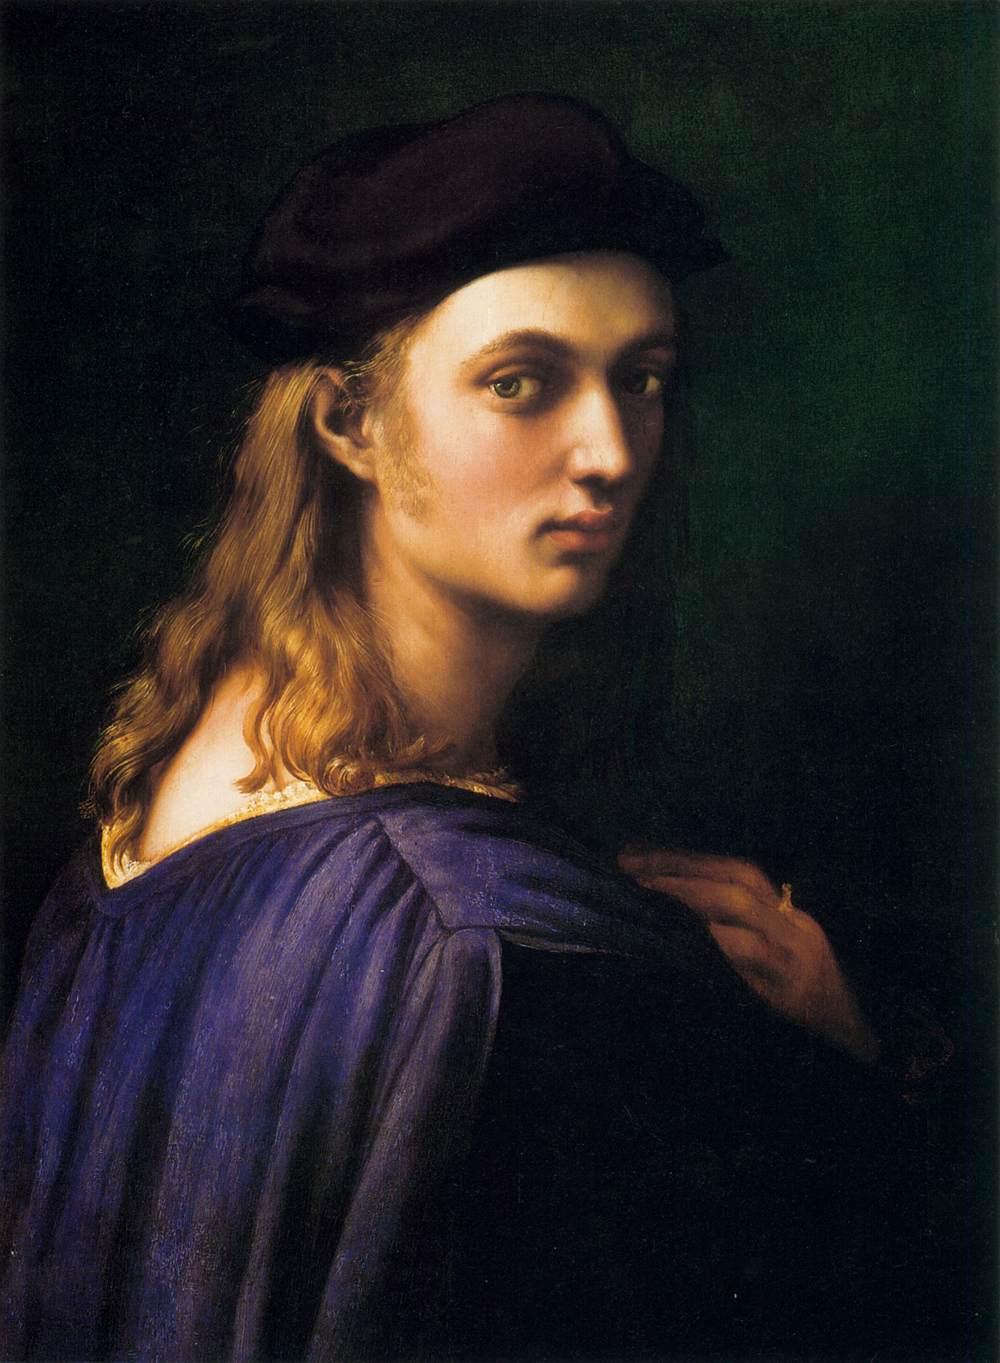 KONANGAL: 4th June 2011; Documentaries on Art - Raphael